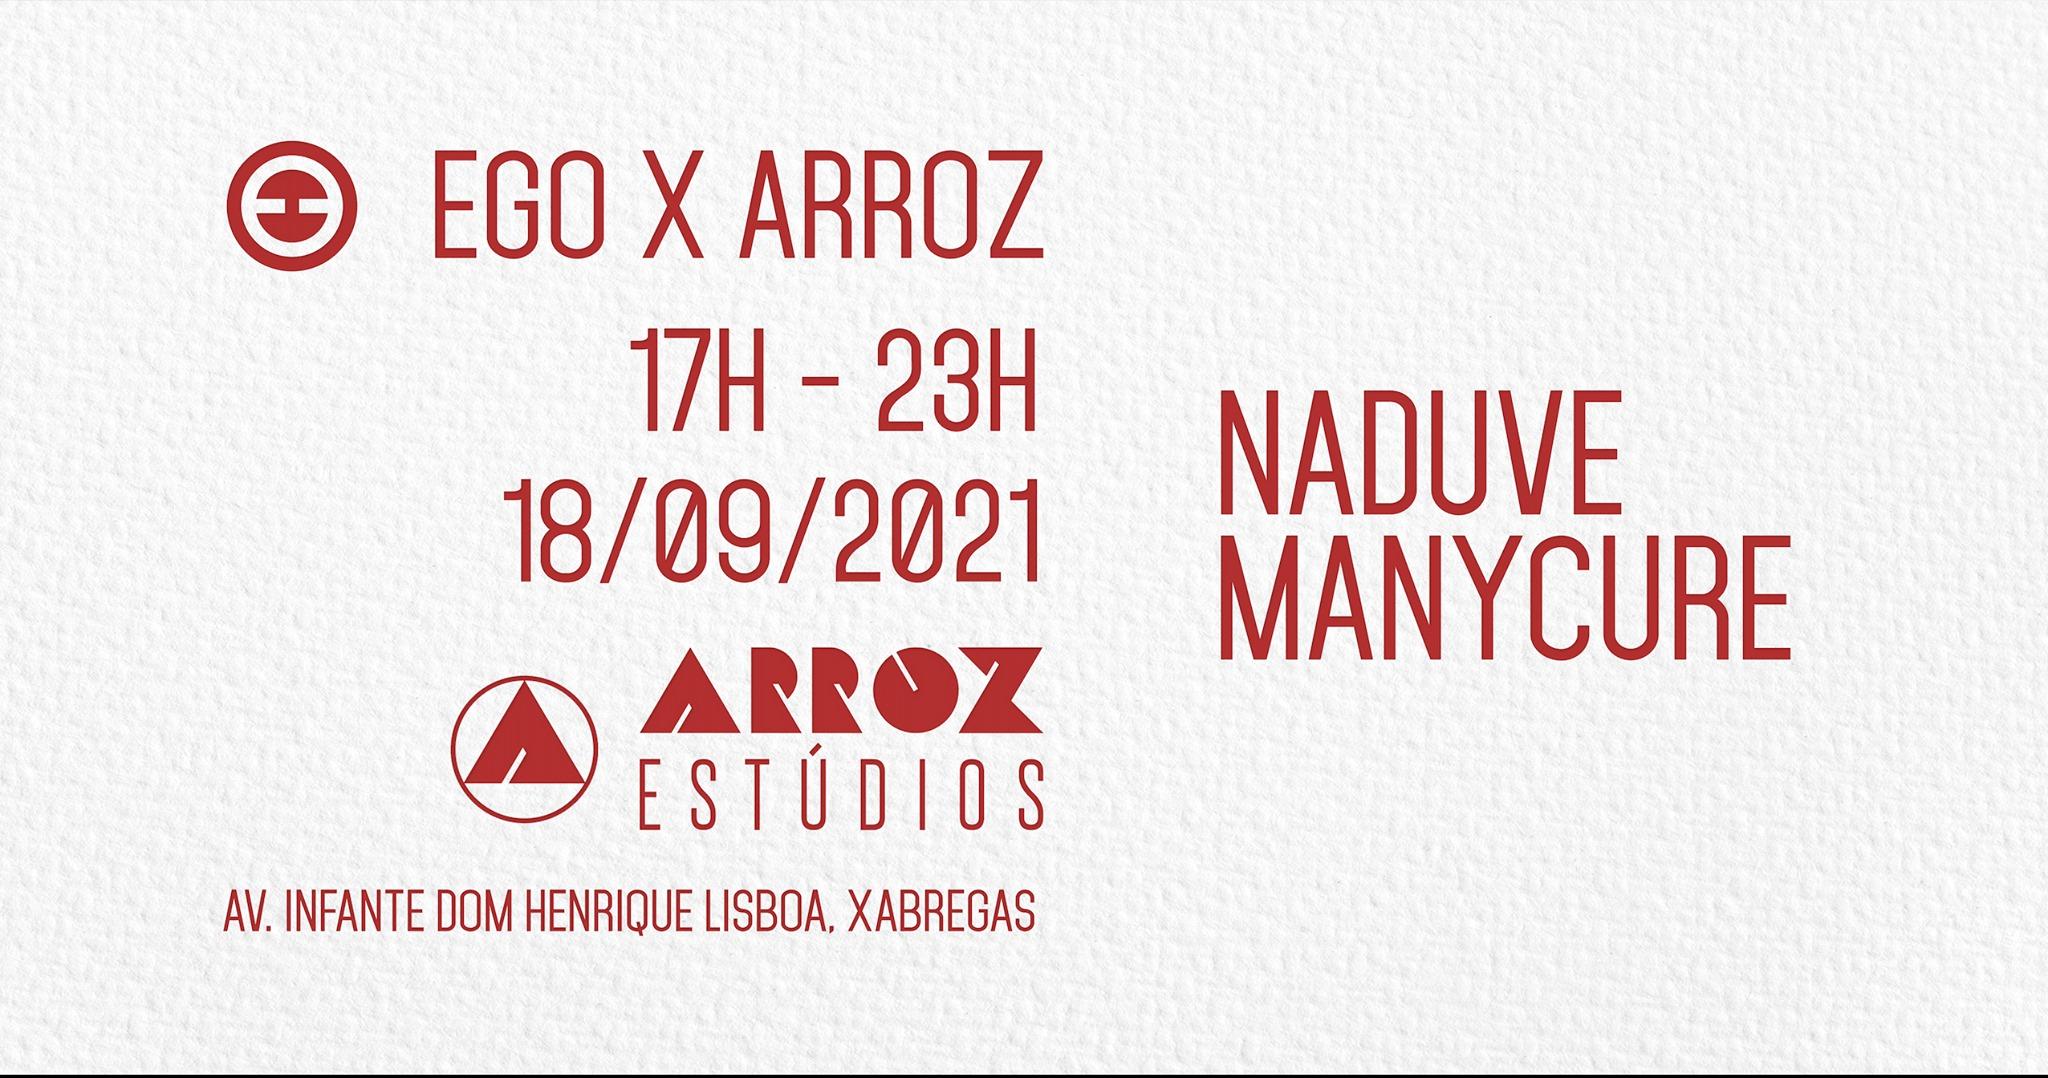 EGO x Arroz with Naduve and Manycure